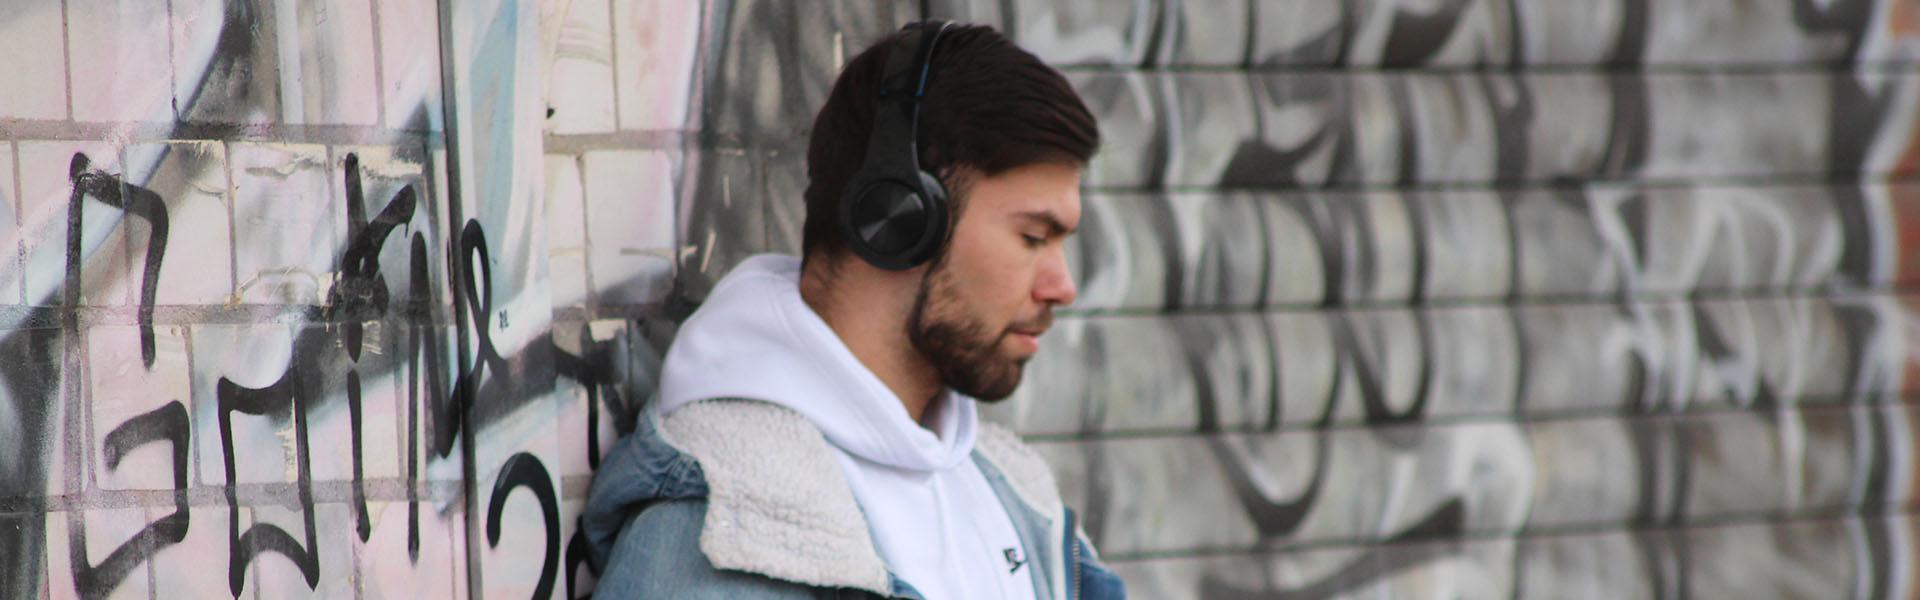 Headset/ Kopfhörer